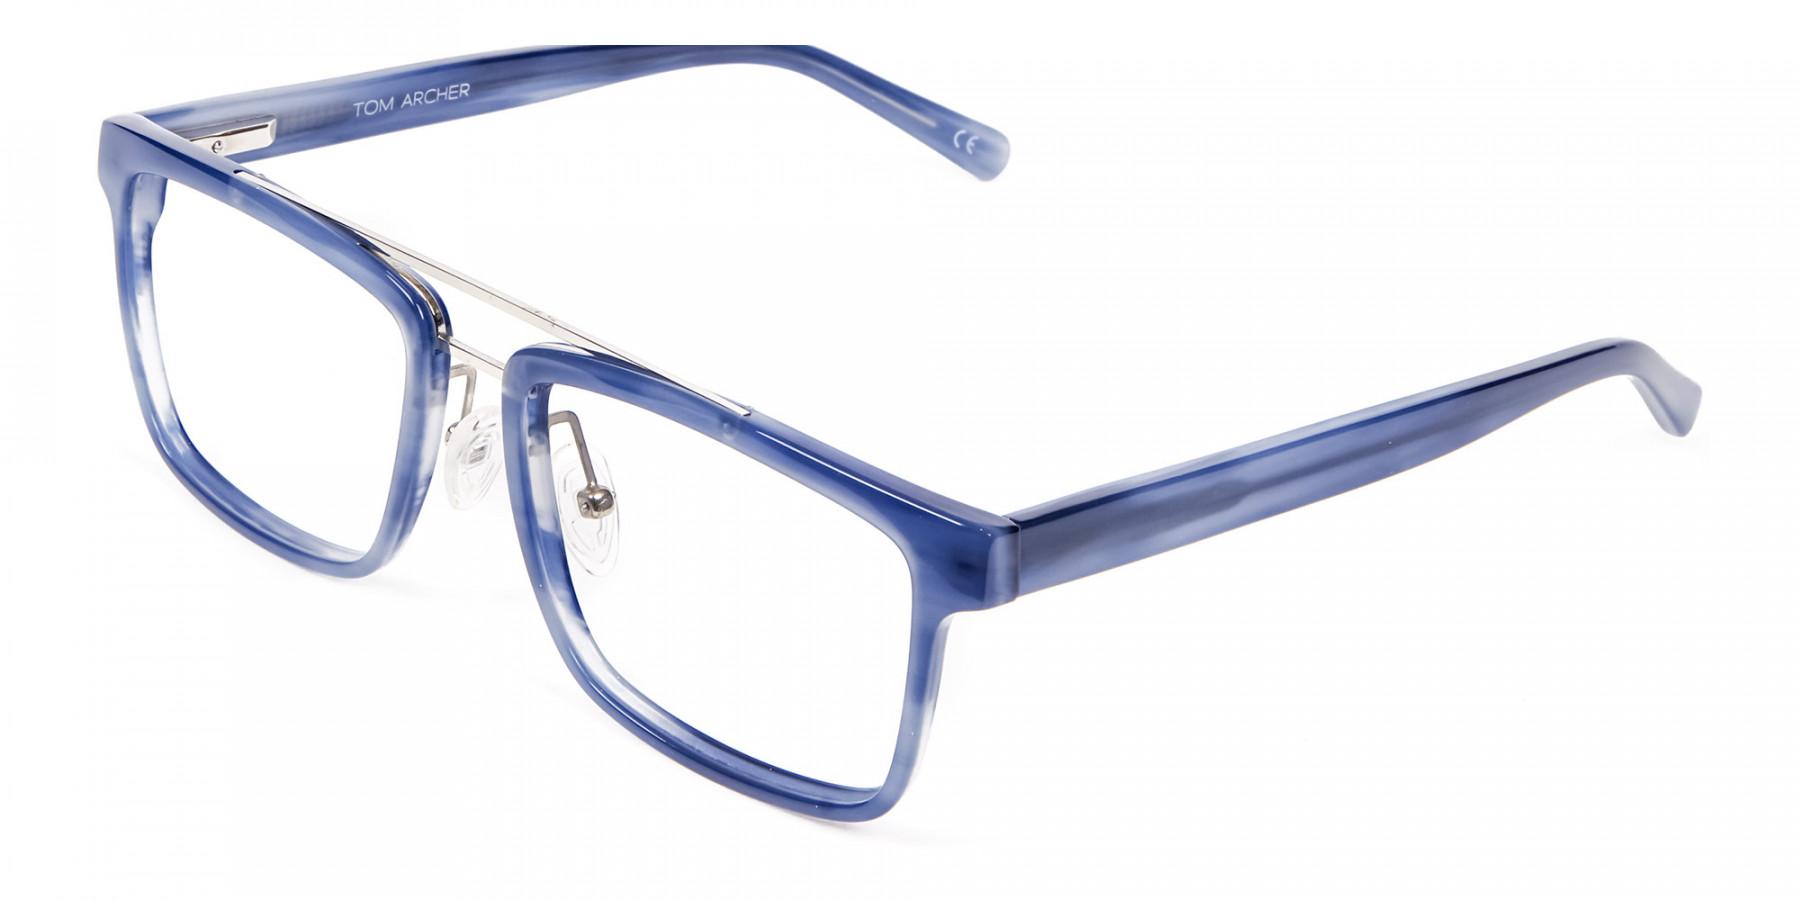 Icy Blue Rectangular Frames